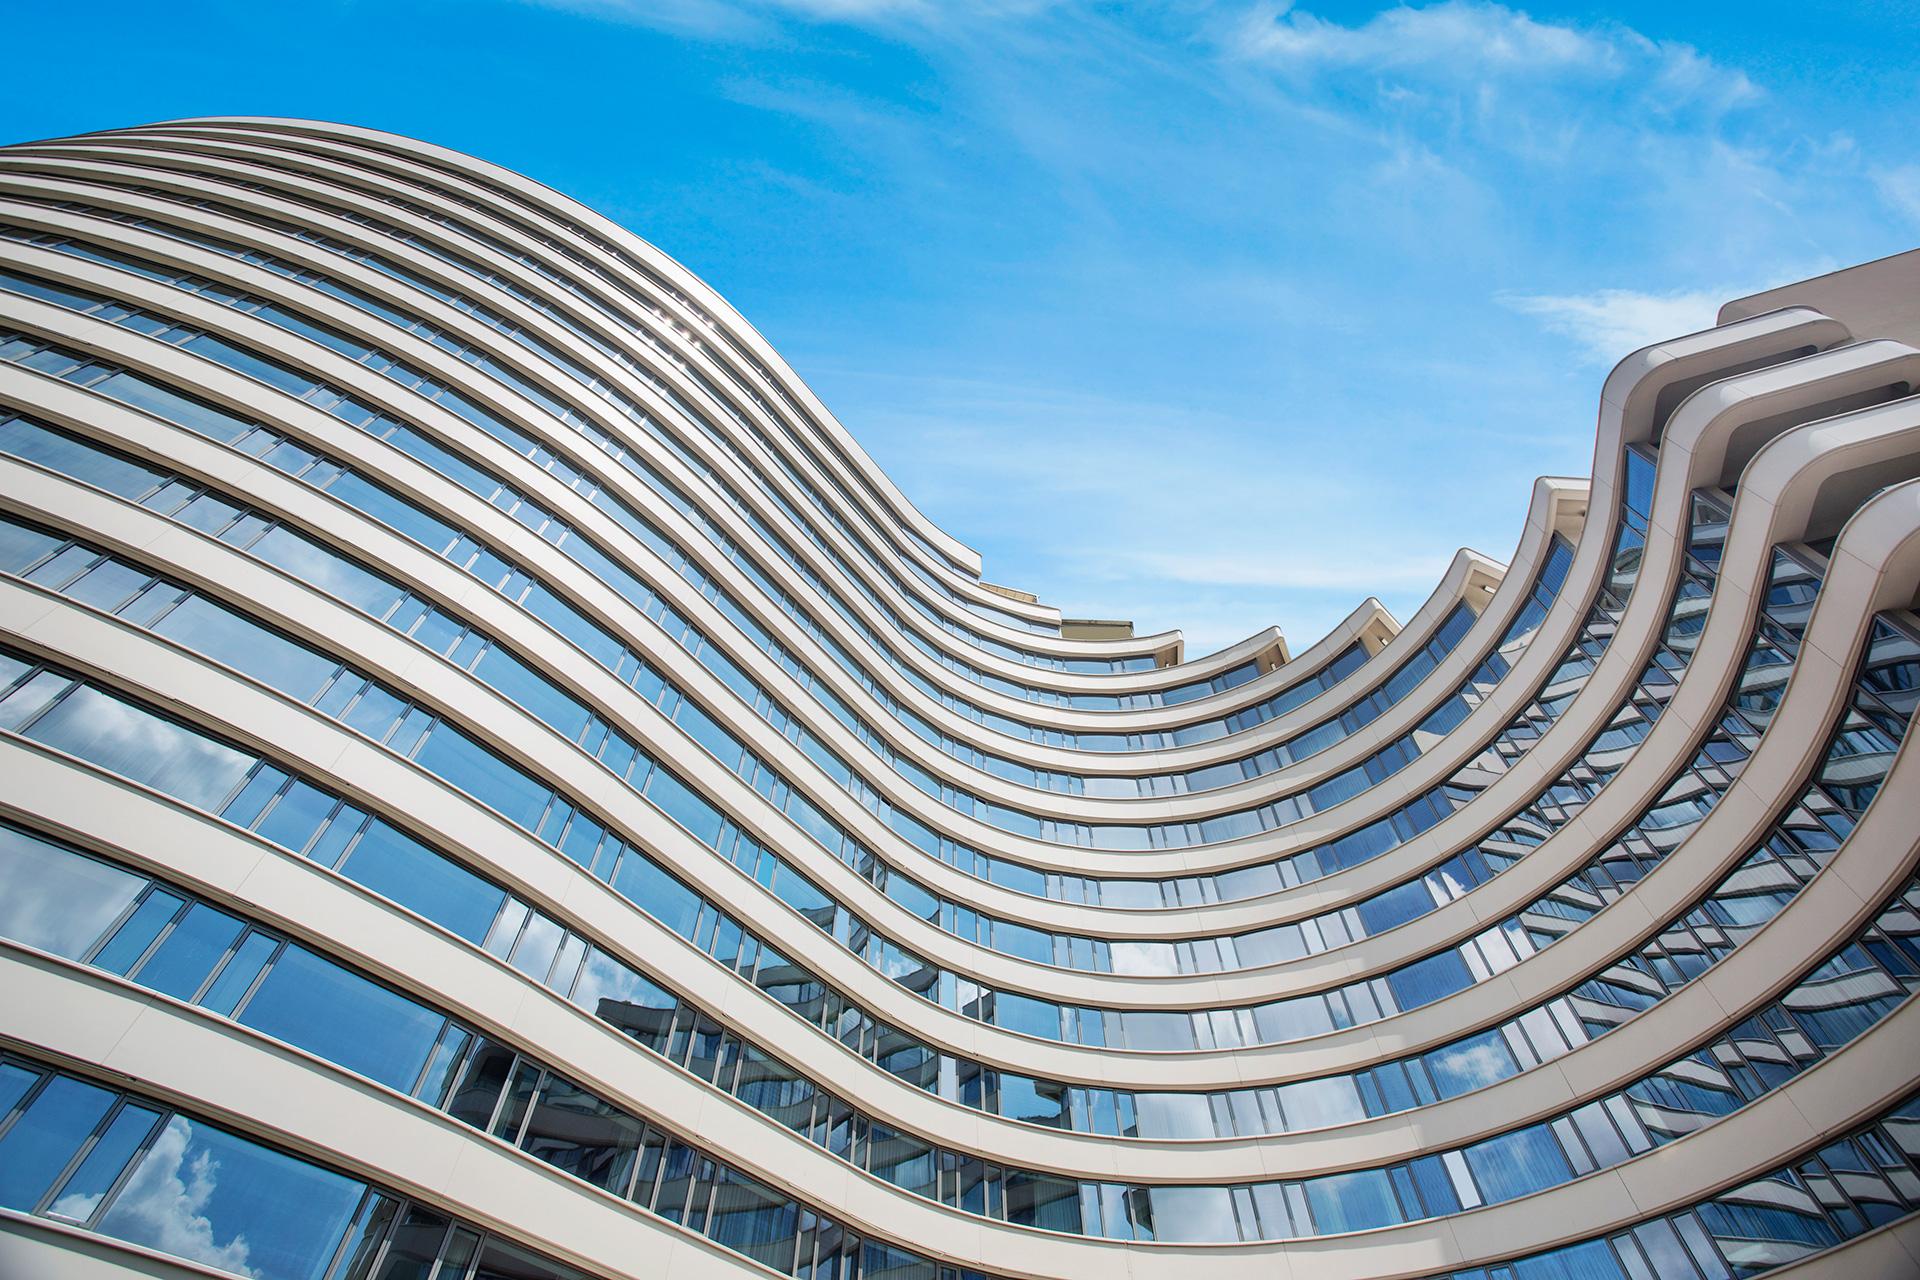 Architectural Retouching